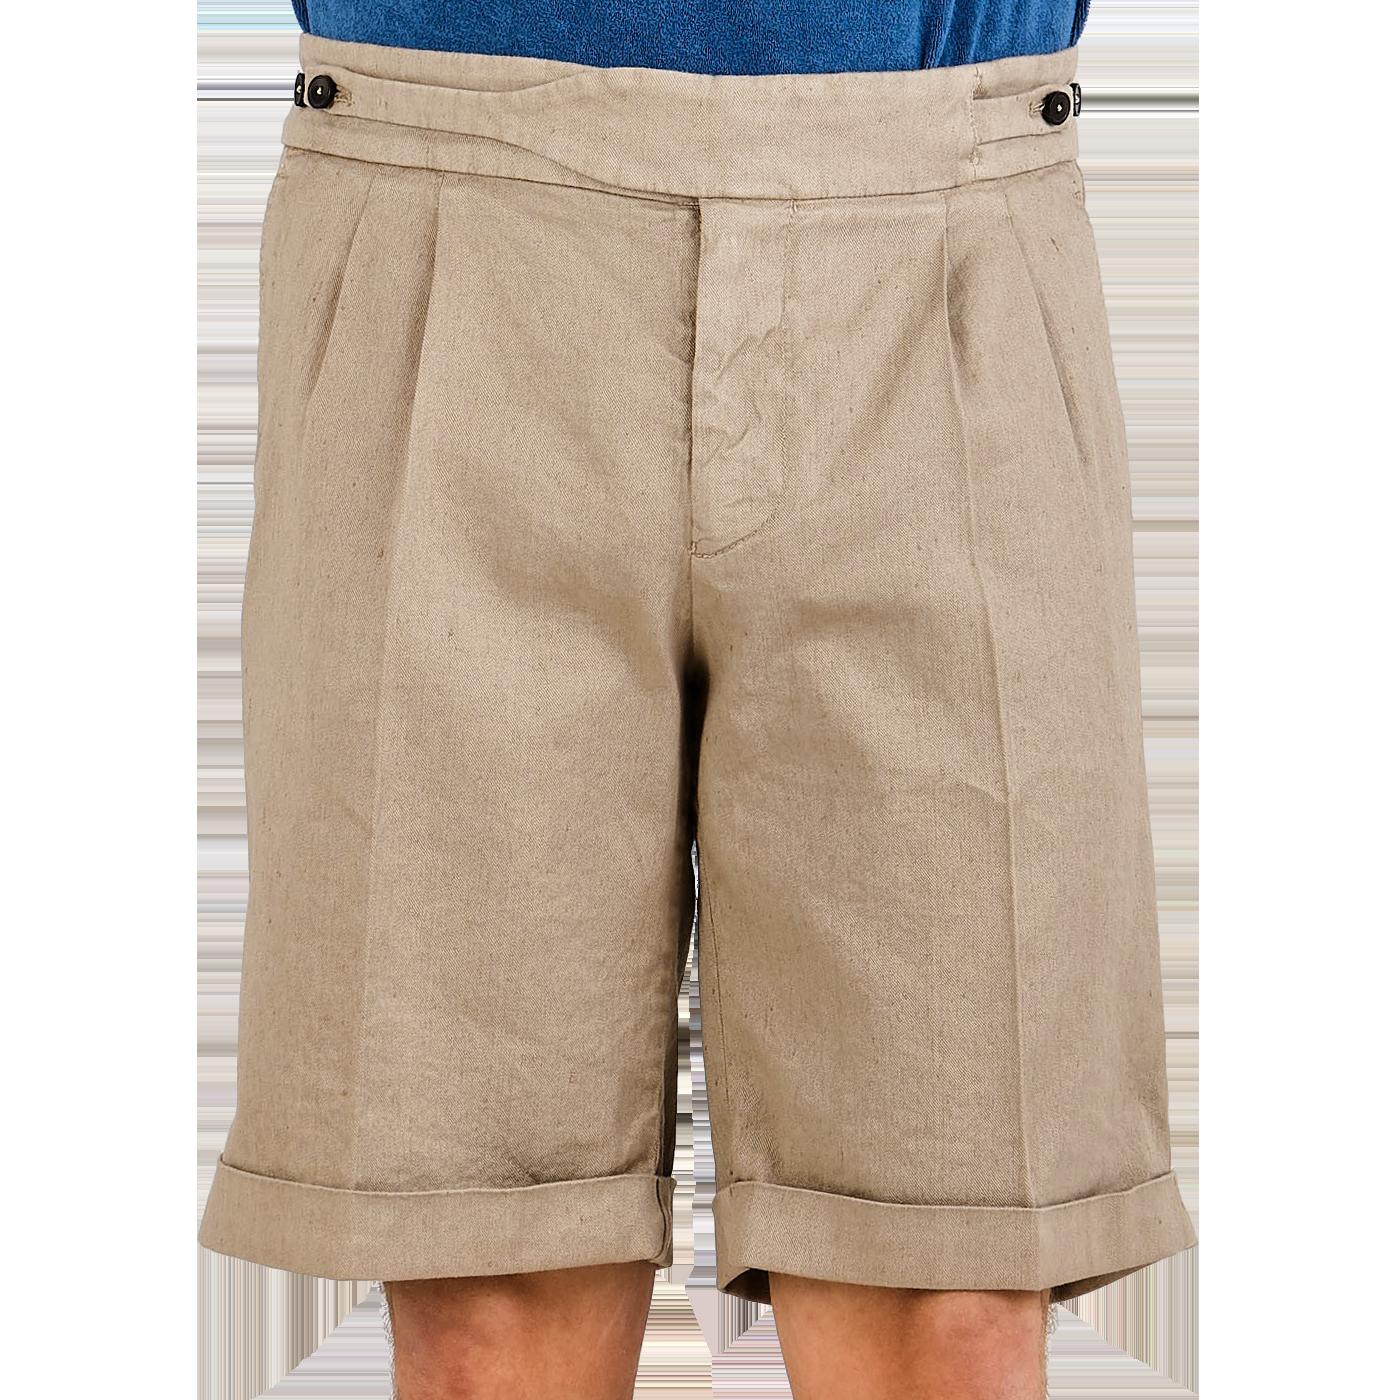 Berwich Dark Beige Linen Cotton Gurkha Shorts Front